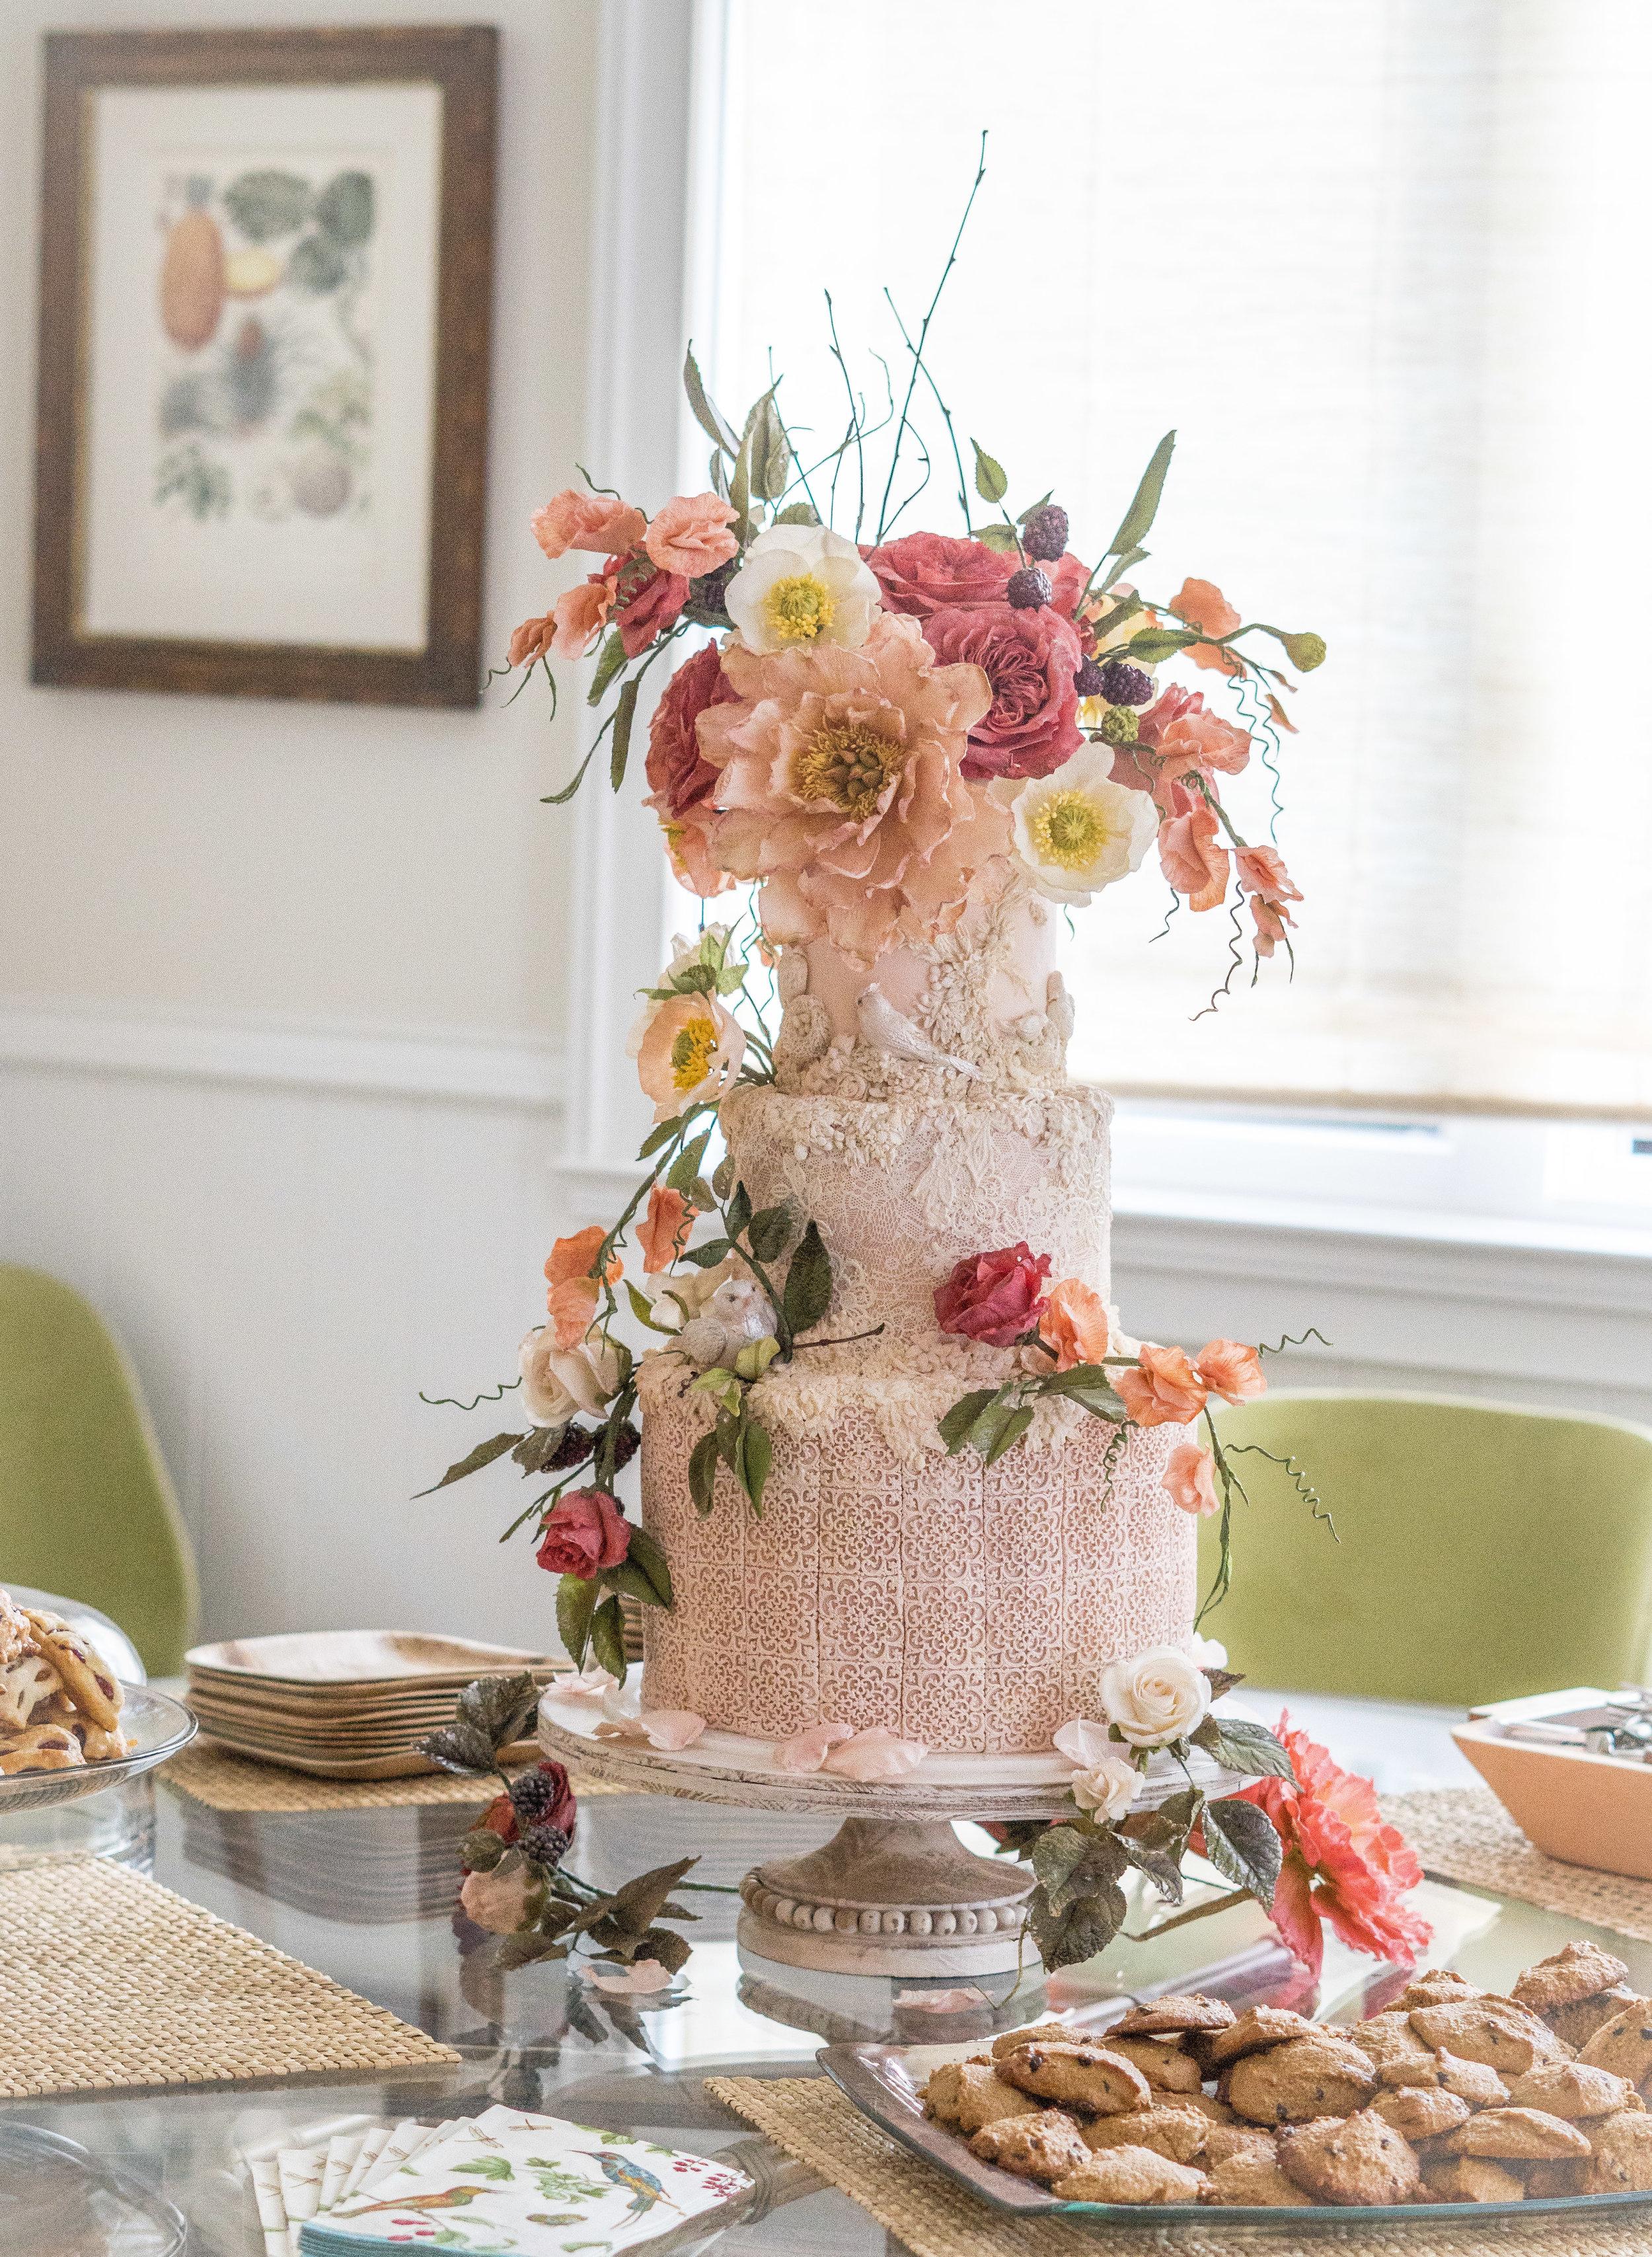 Lady Kinvara Balfour's Cake